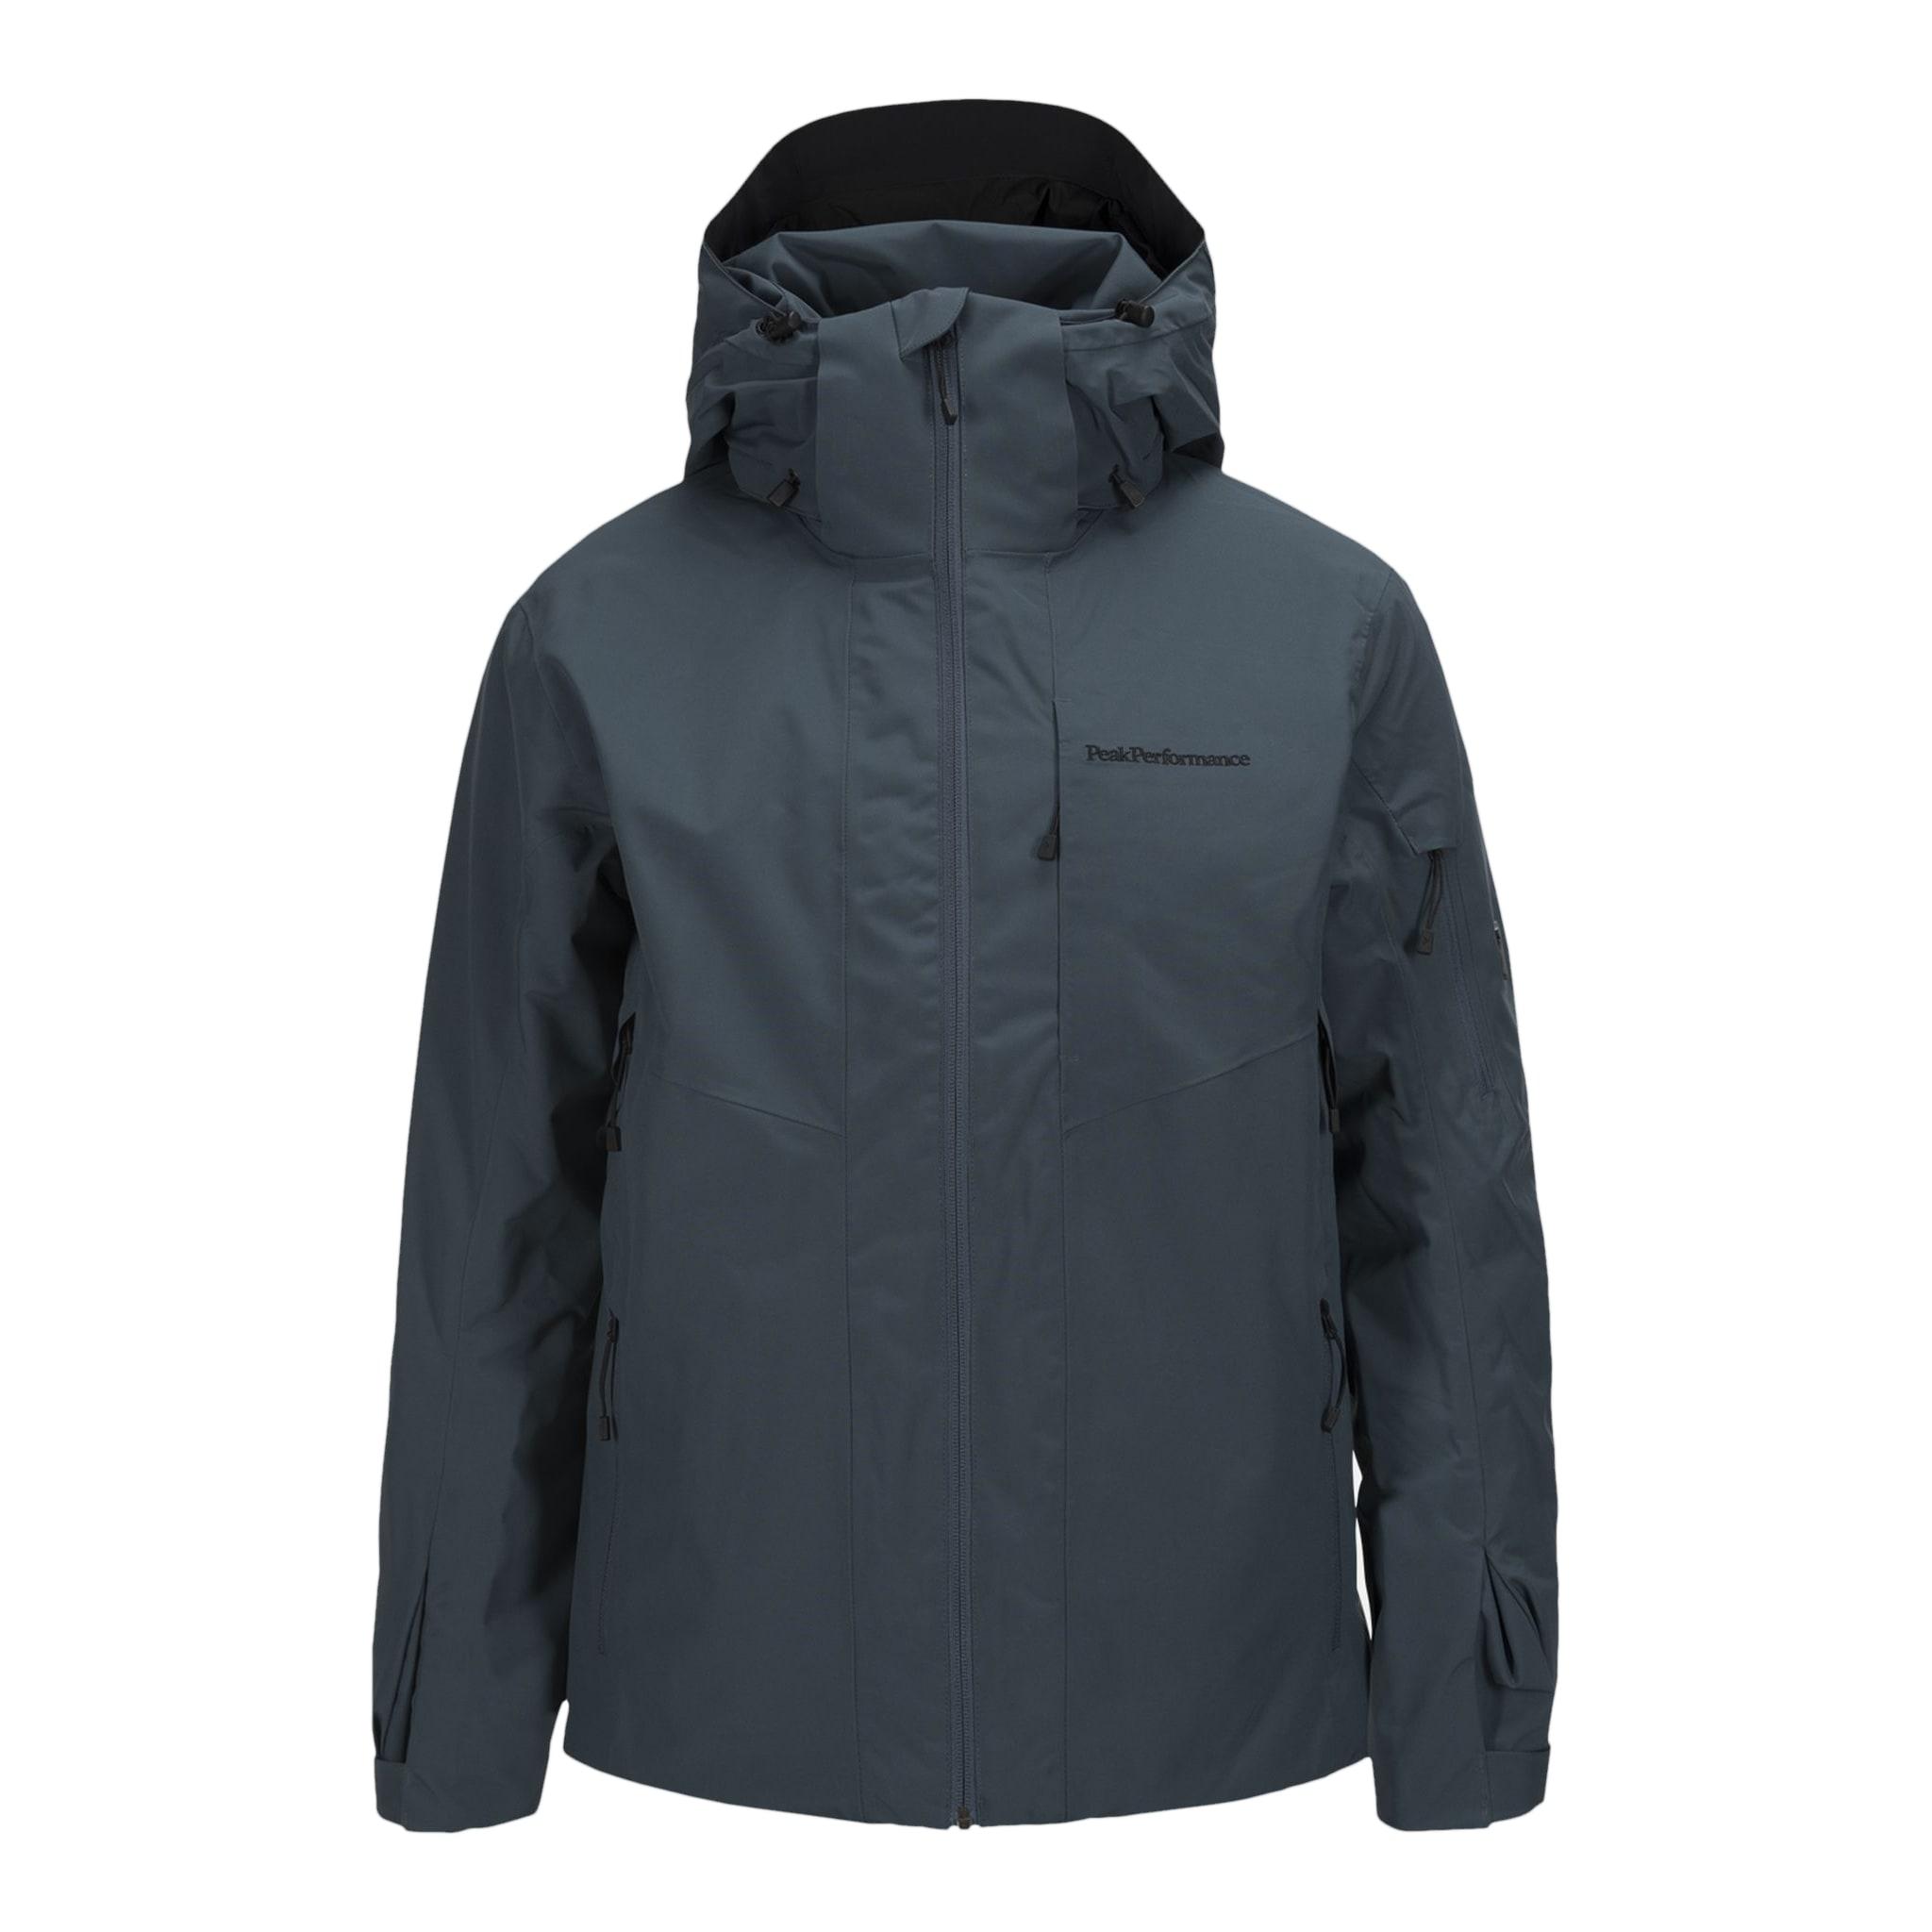 Maroon2 jacket